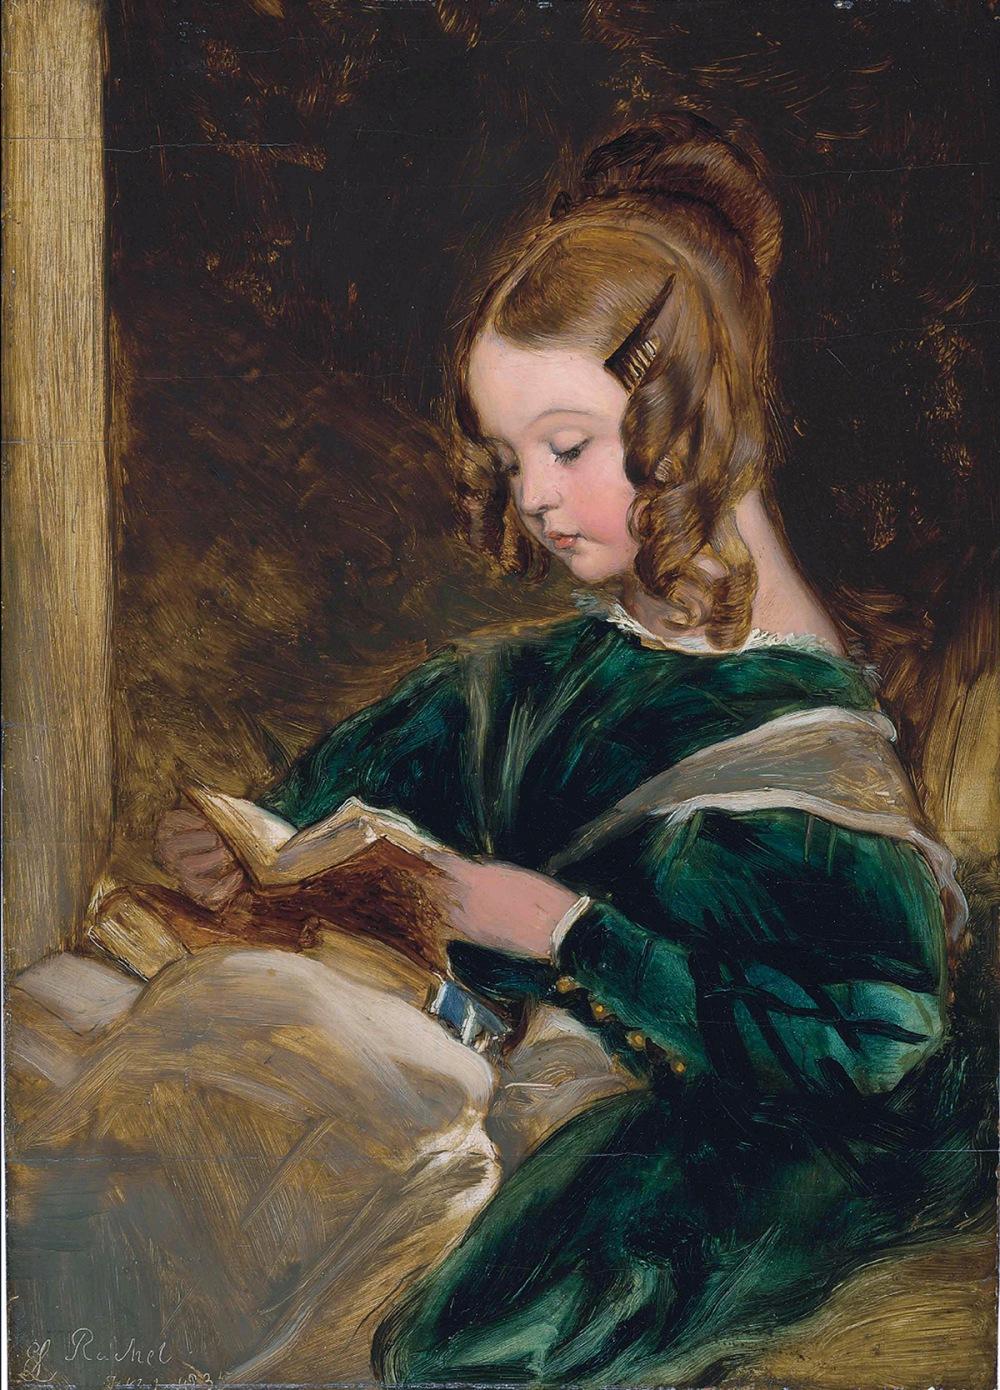 Edwin Henry Landseer. Boceto de Lady Evelyn Rachel  Russell. 1835. Colección particular.